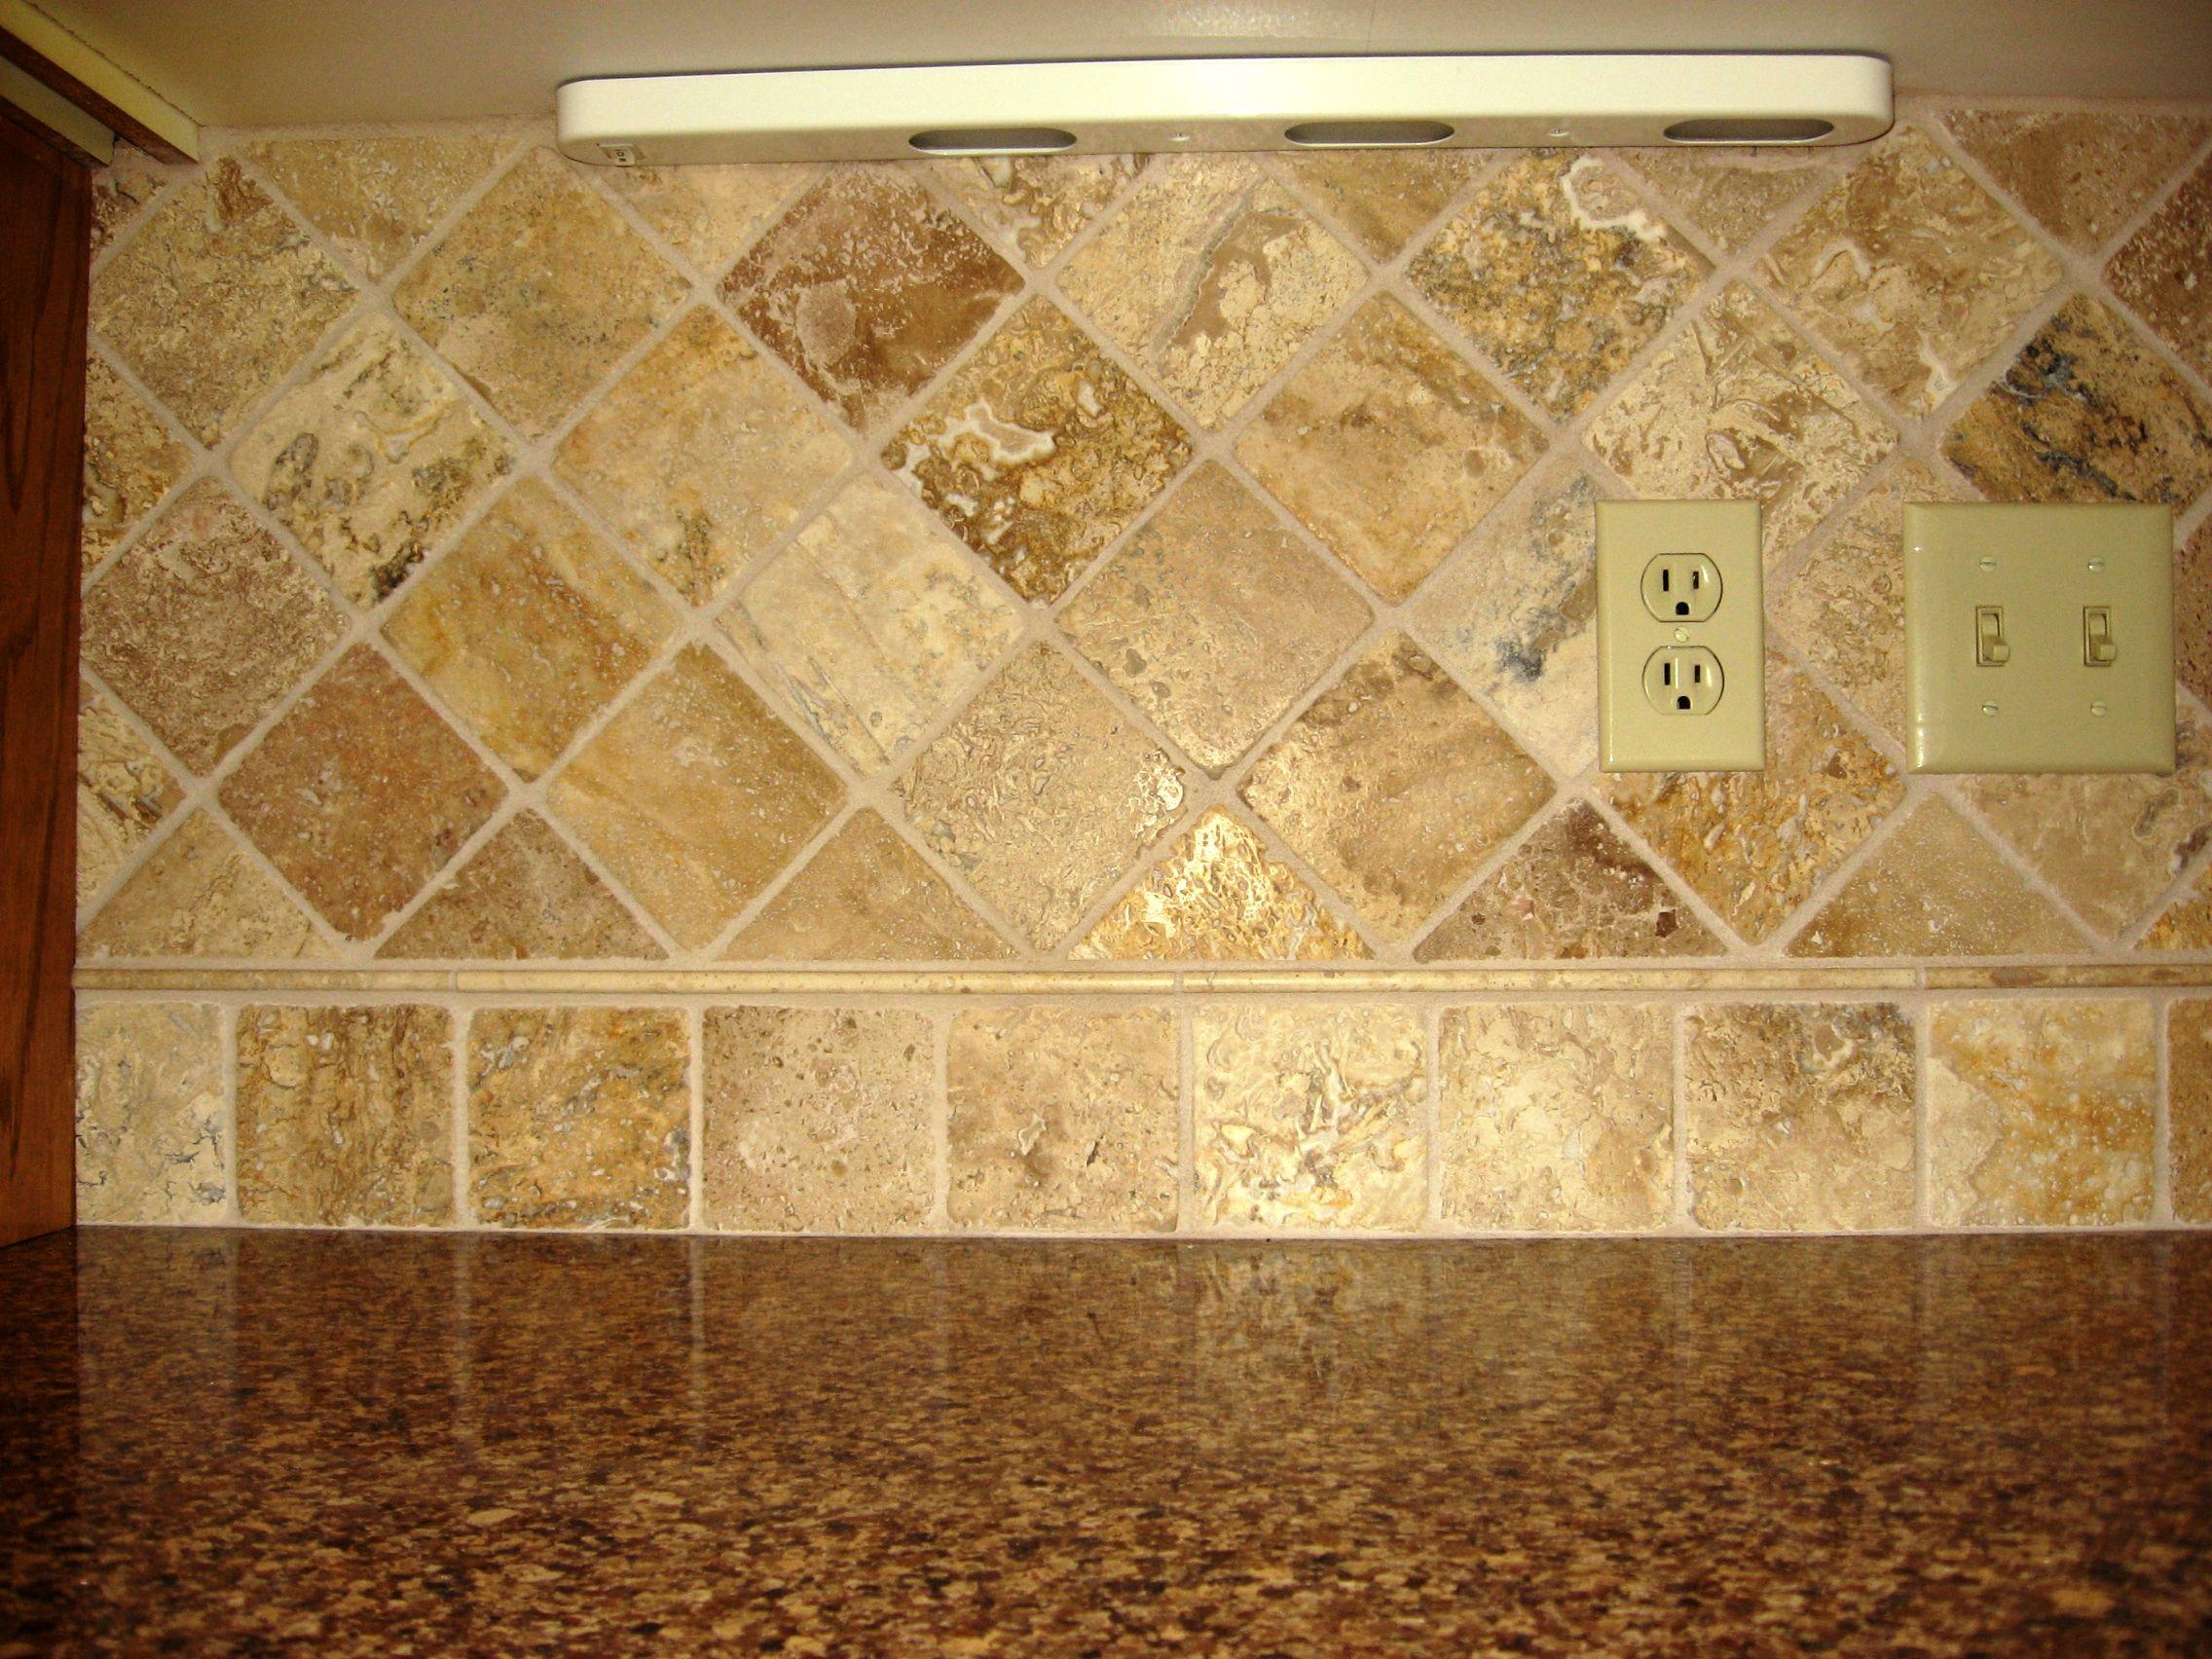 Houses kitchen backsplash tile pattern design ideas back splash new backsplash ideas diamond pattern tile kitchen backsplash ideas dailygadgetfo Choice Image